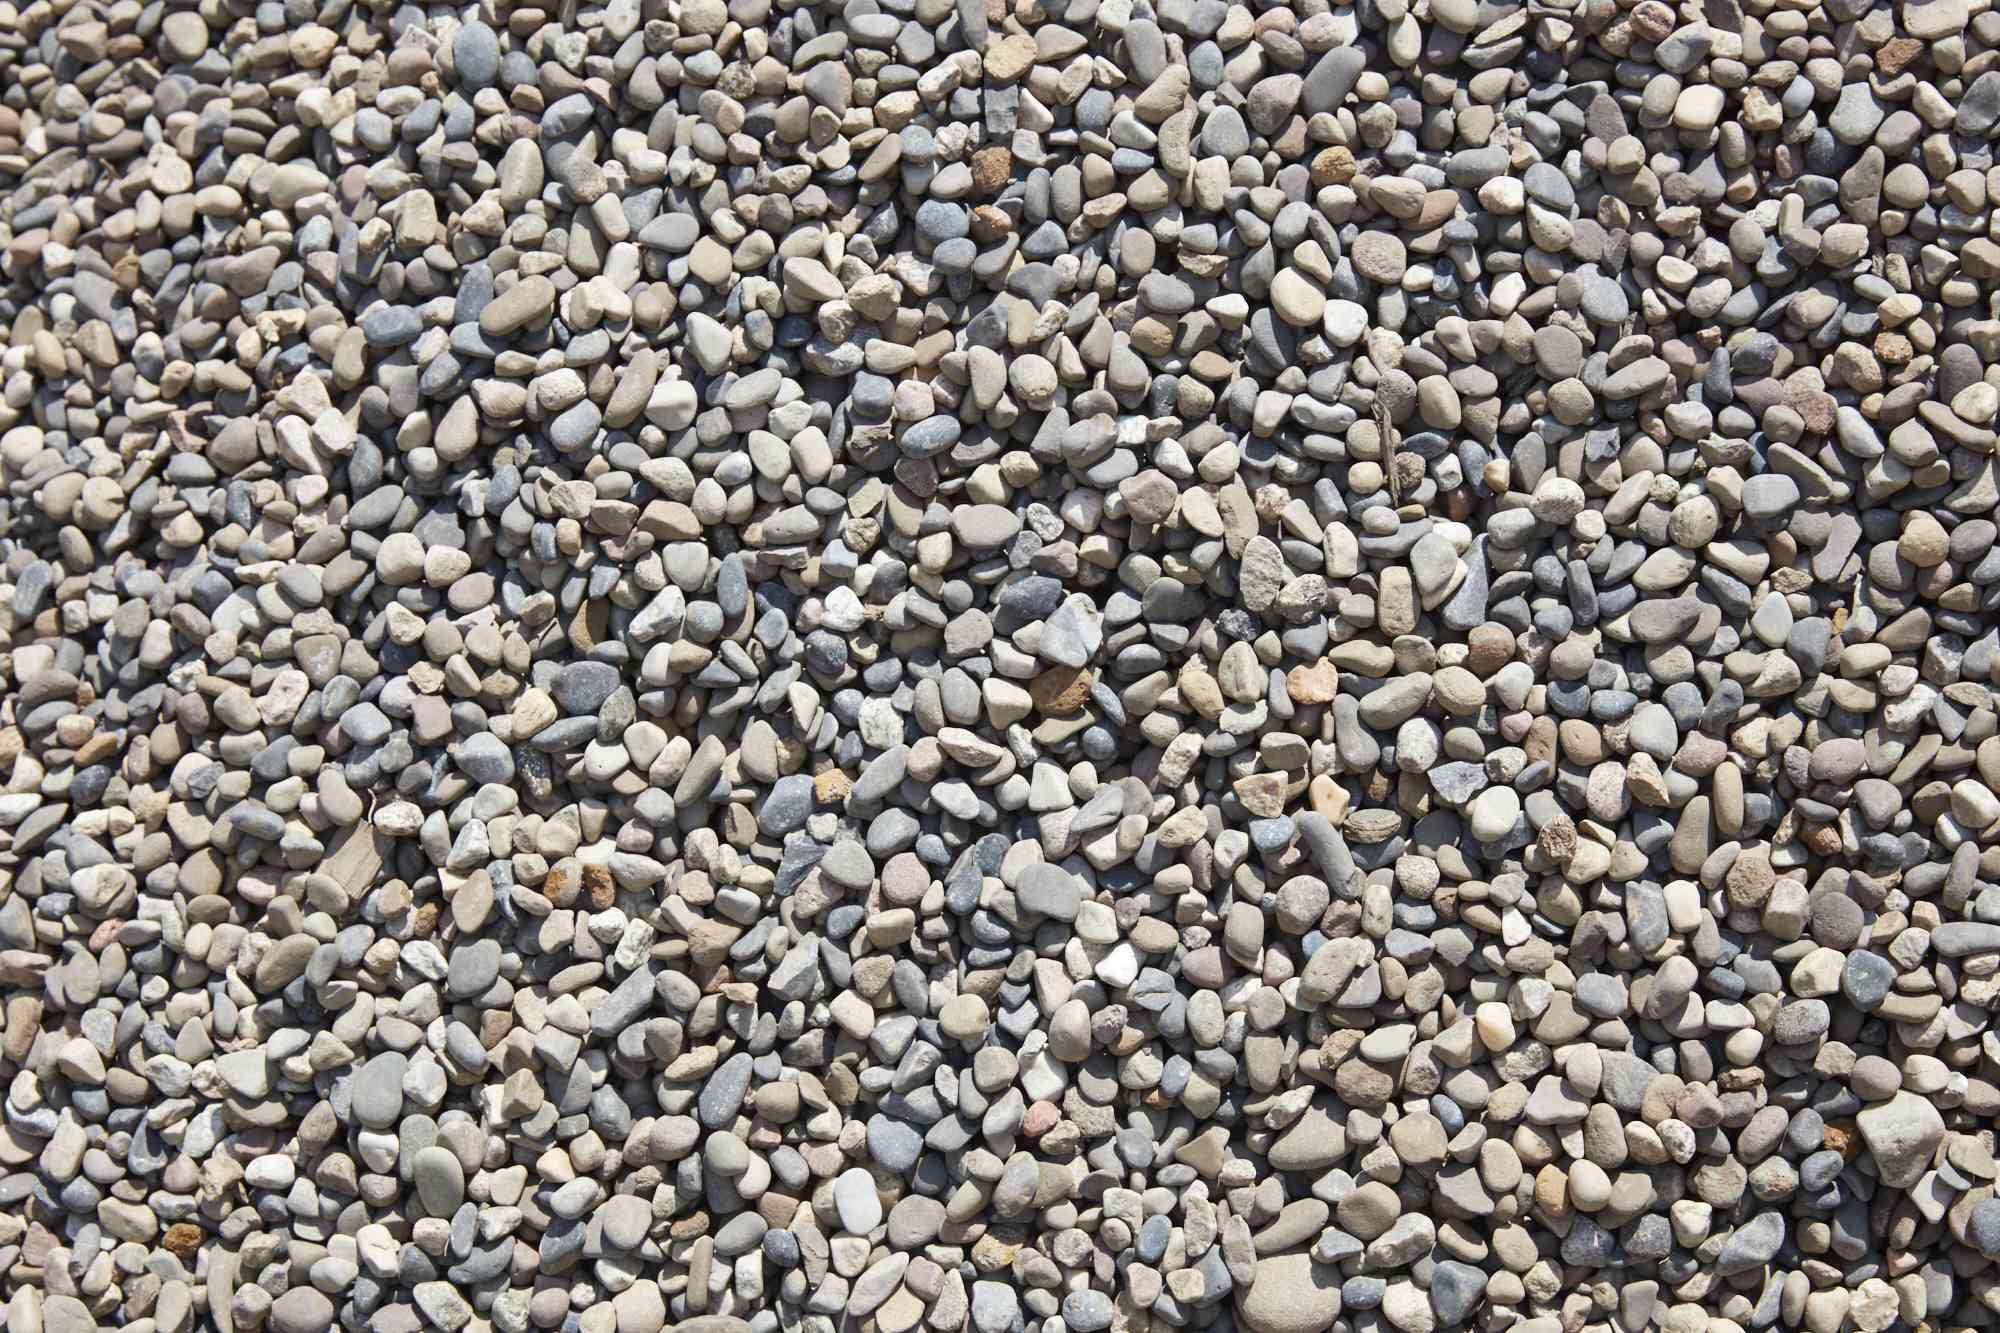 Loose materials of pea gravel in sunlight